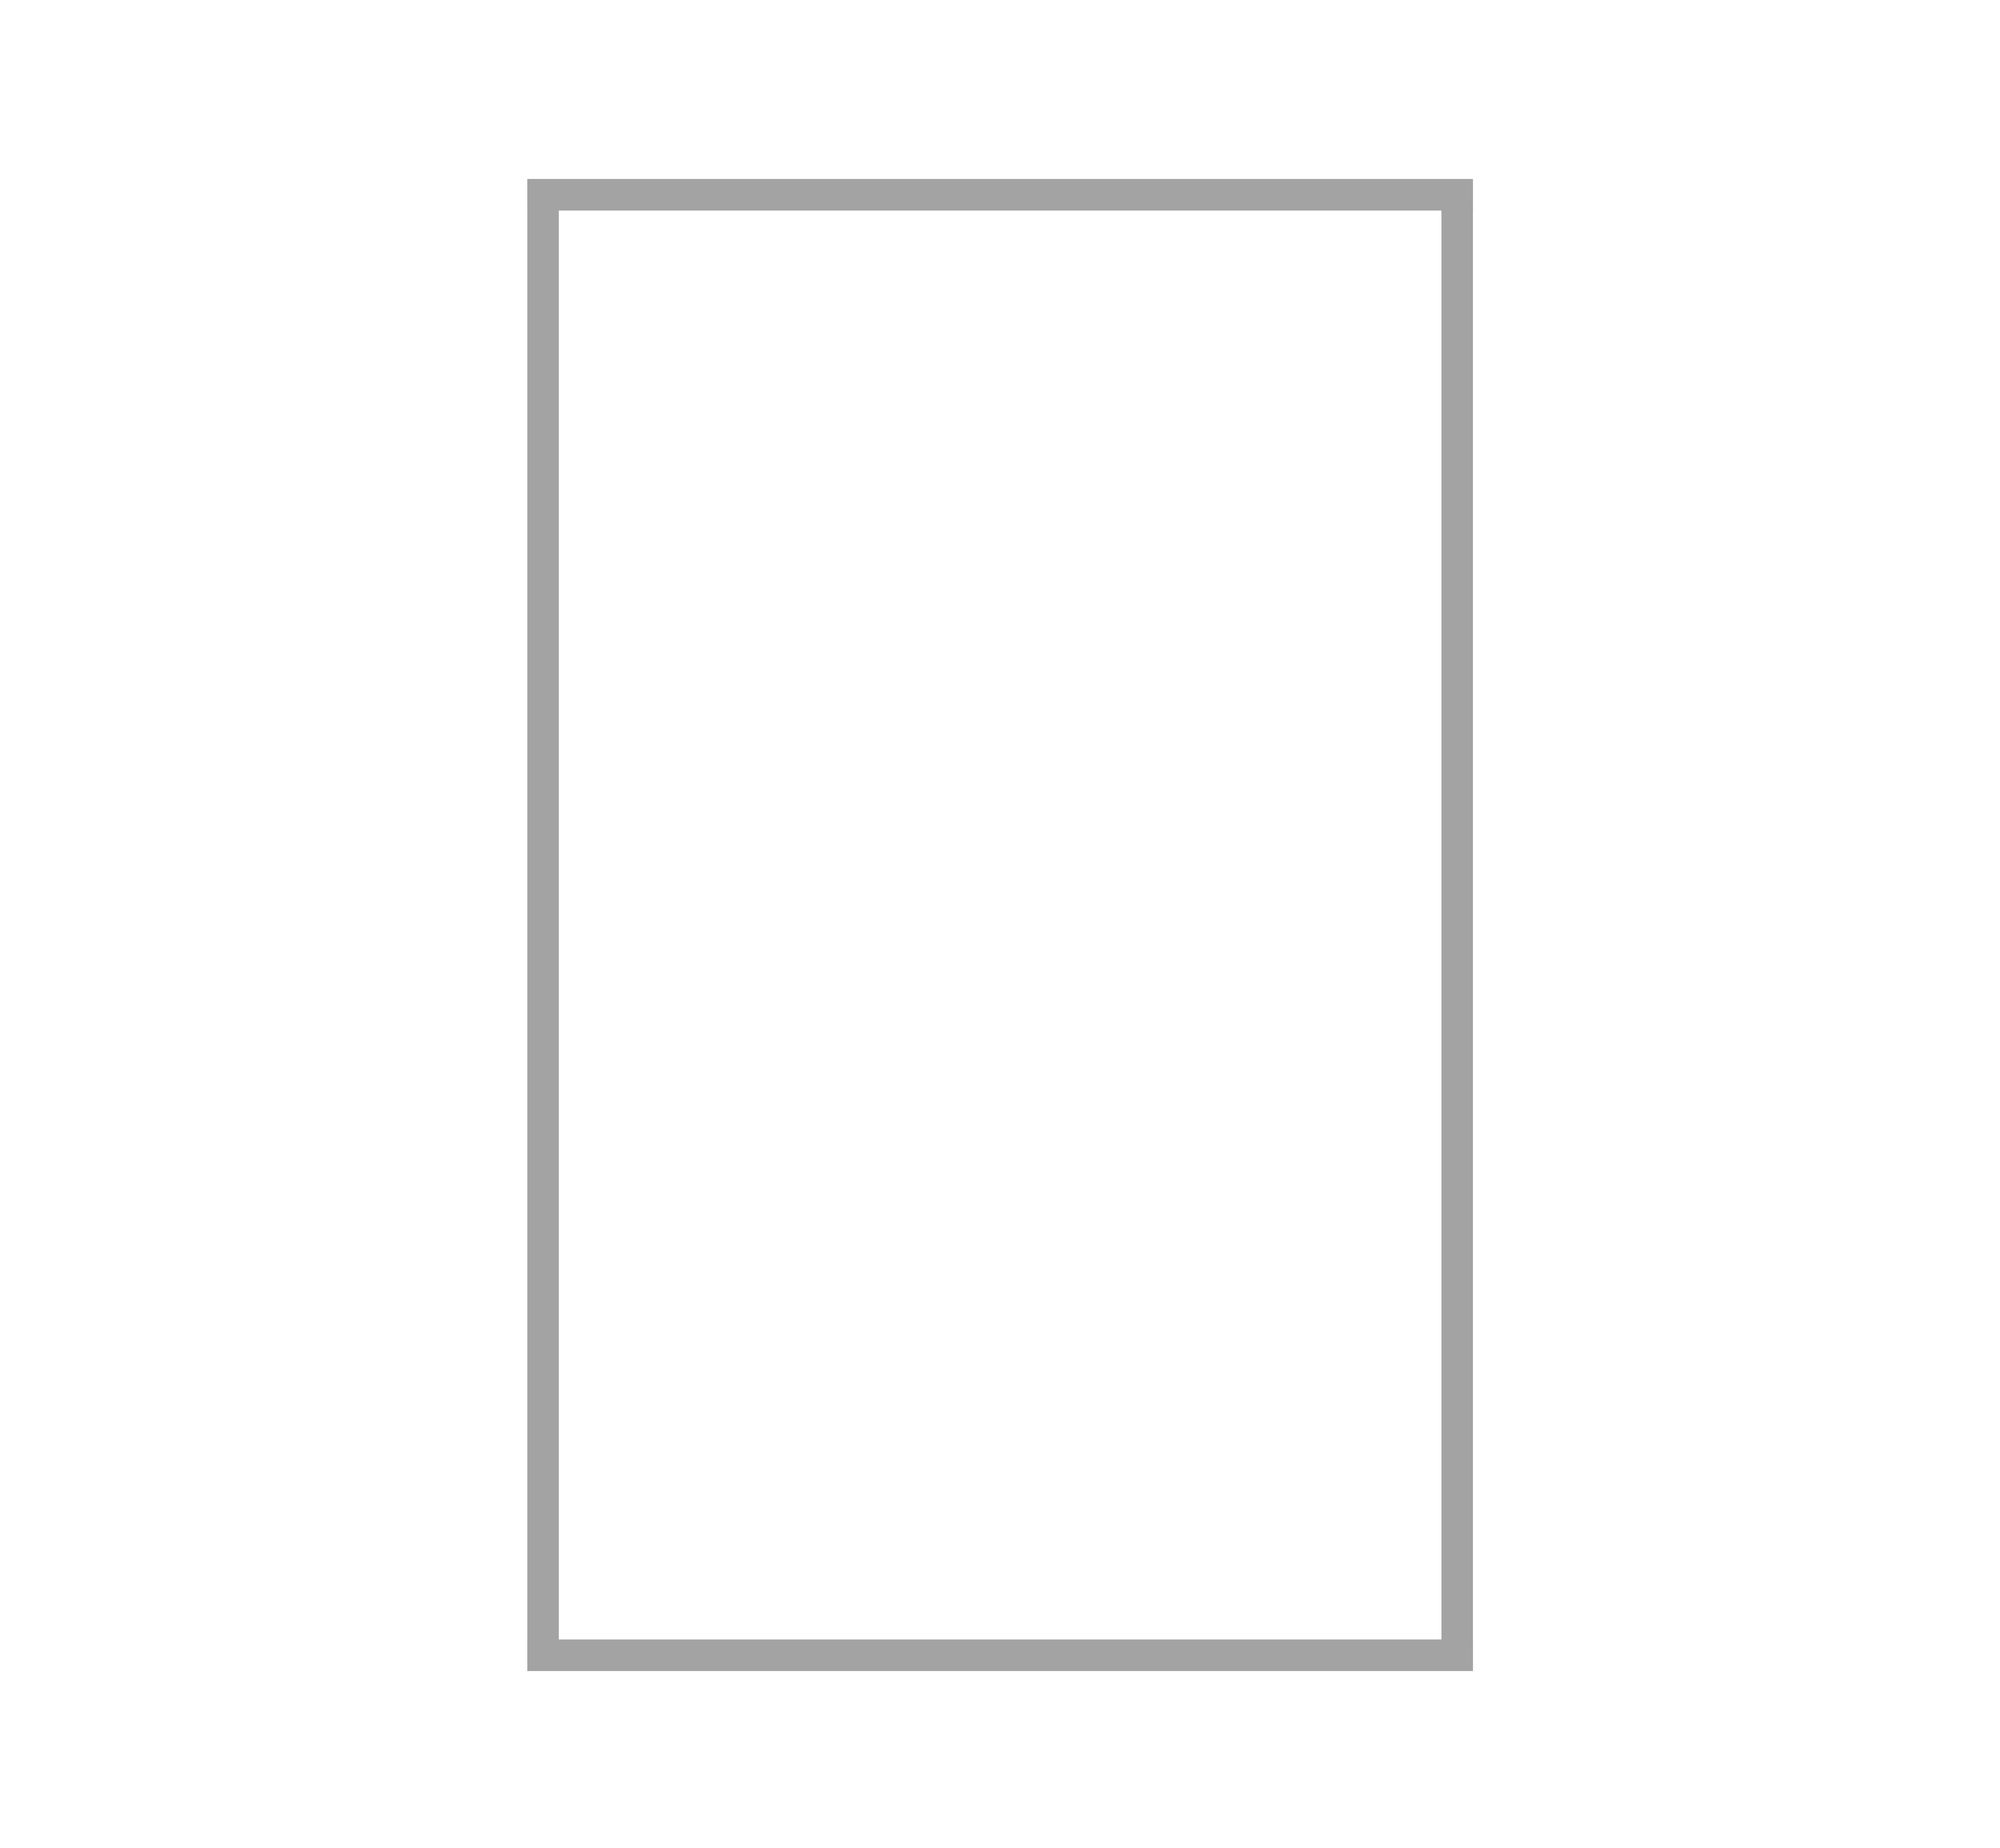 Pedestrian Gate Frame | Fence and Gate Supplies | Australia